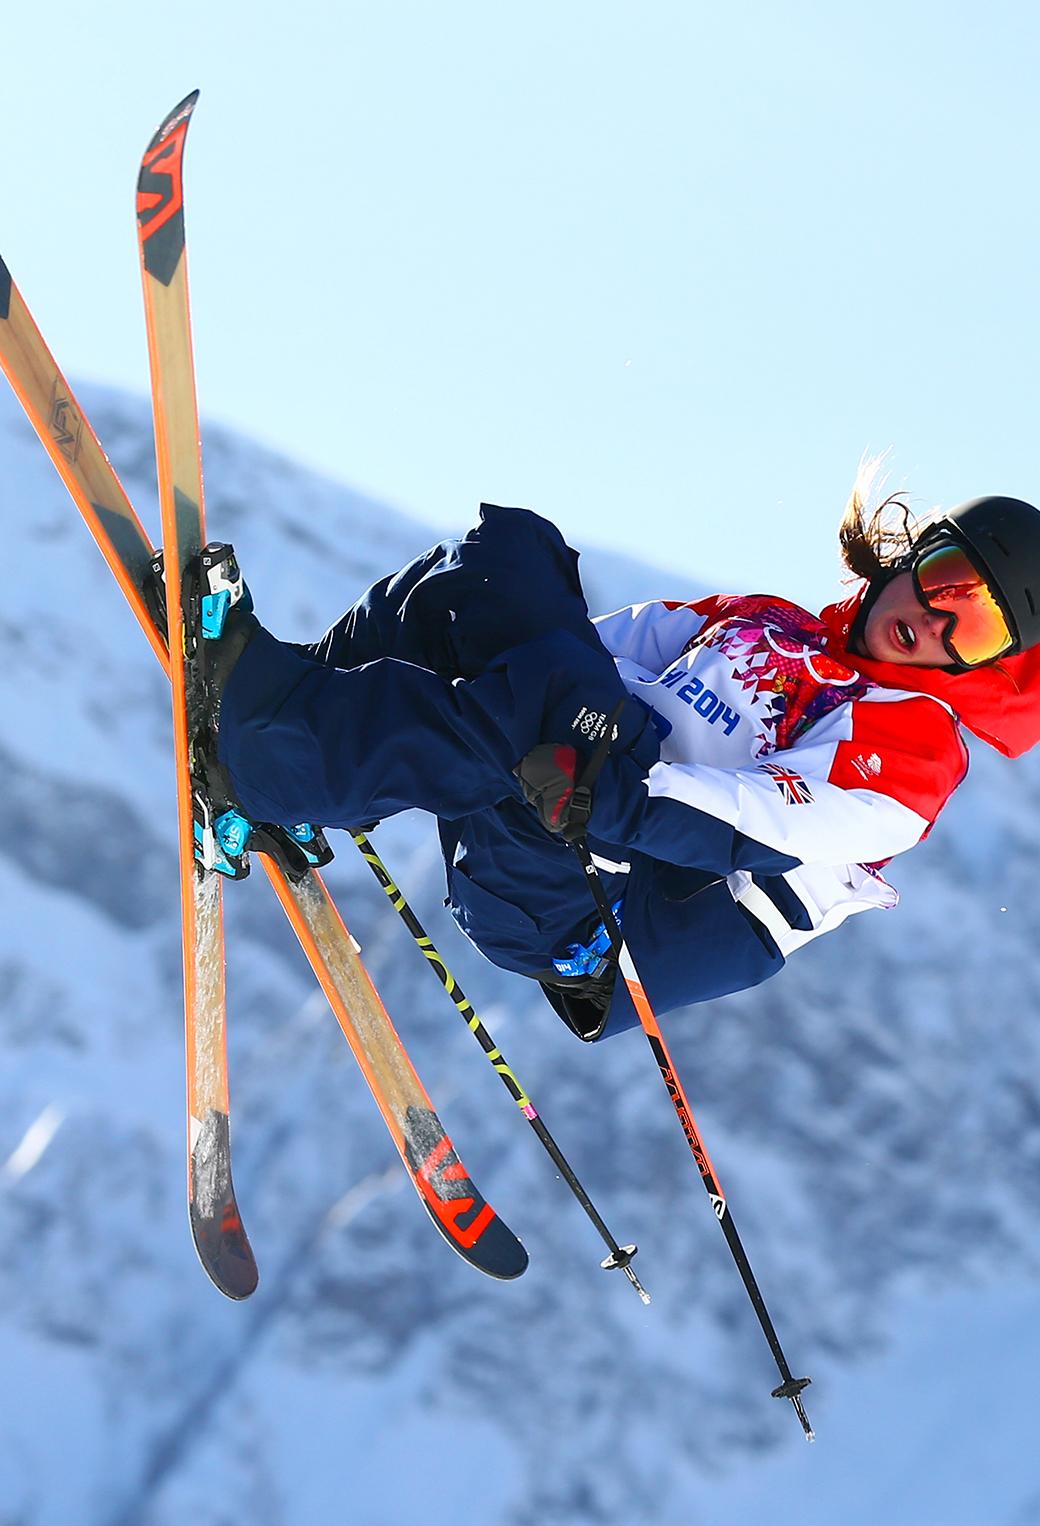 Sochi 2014 Ski Freestyle 3Wallpapers iphone Parallax Sochi 2014 Ski Freestyle